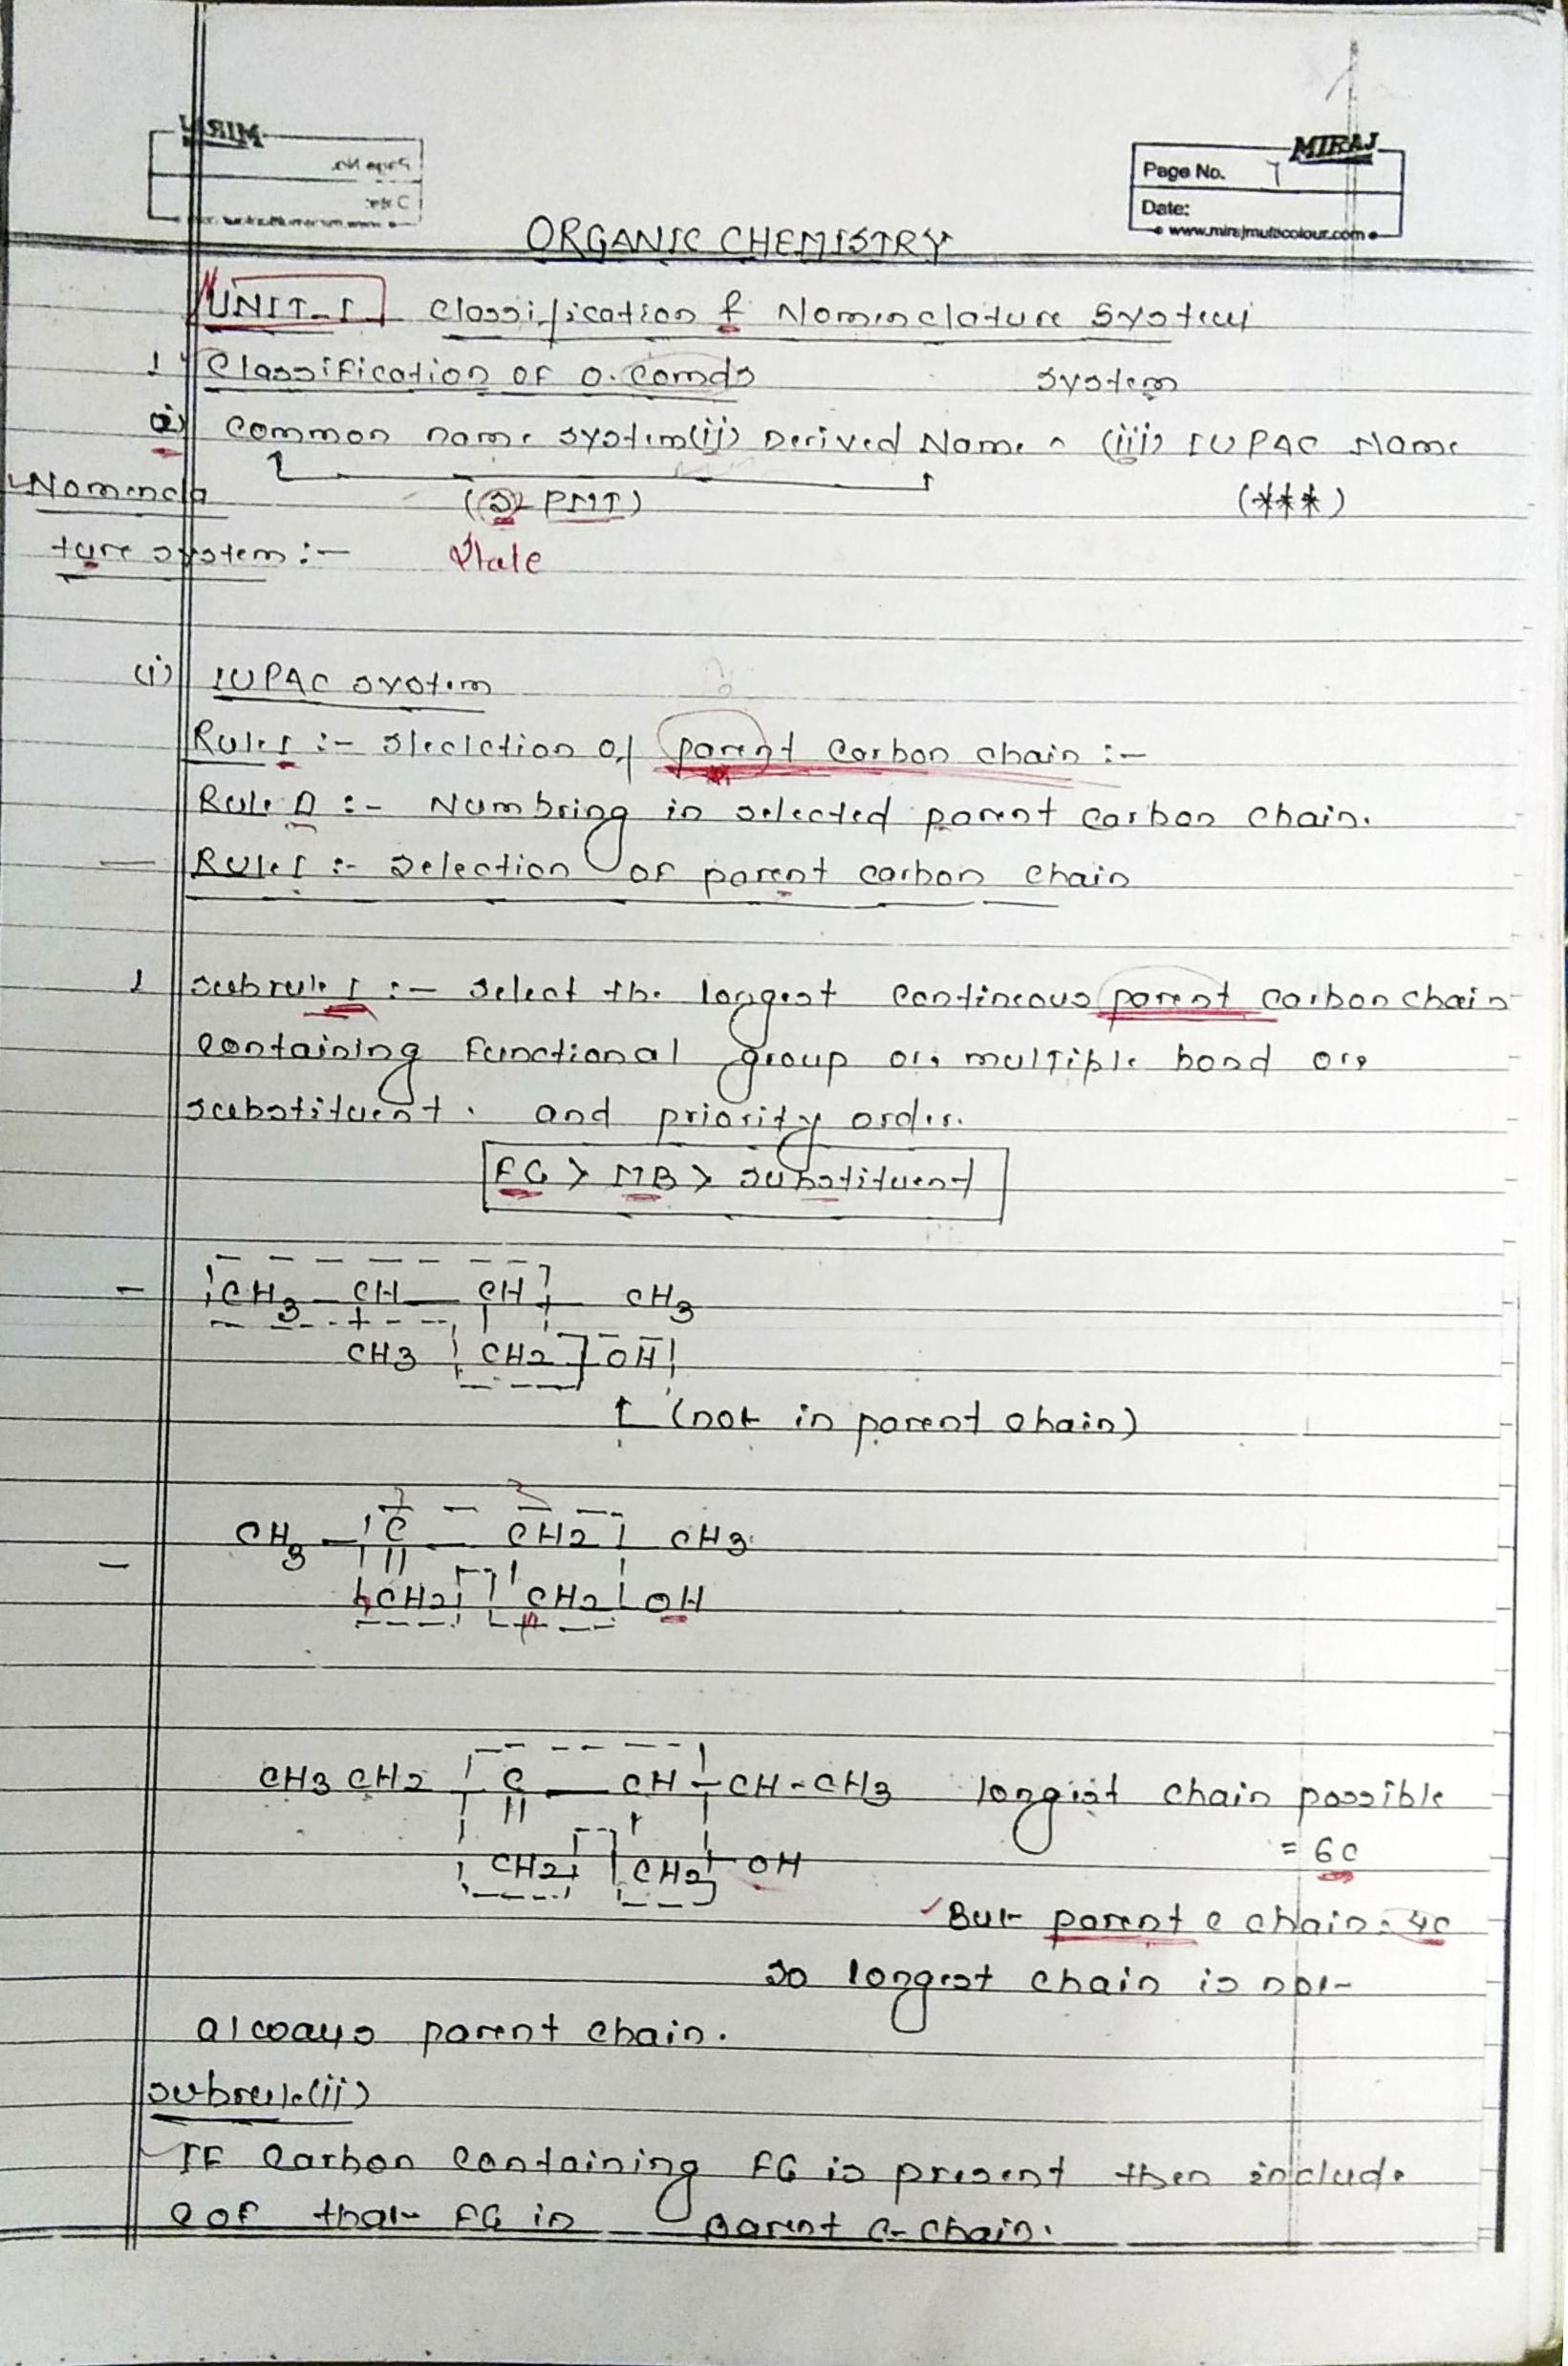 Organic Chemistry Notes